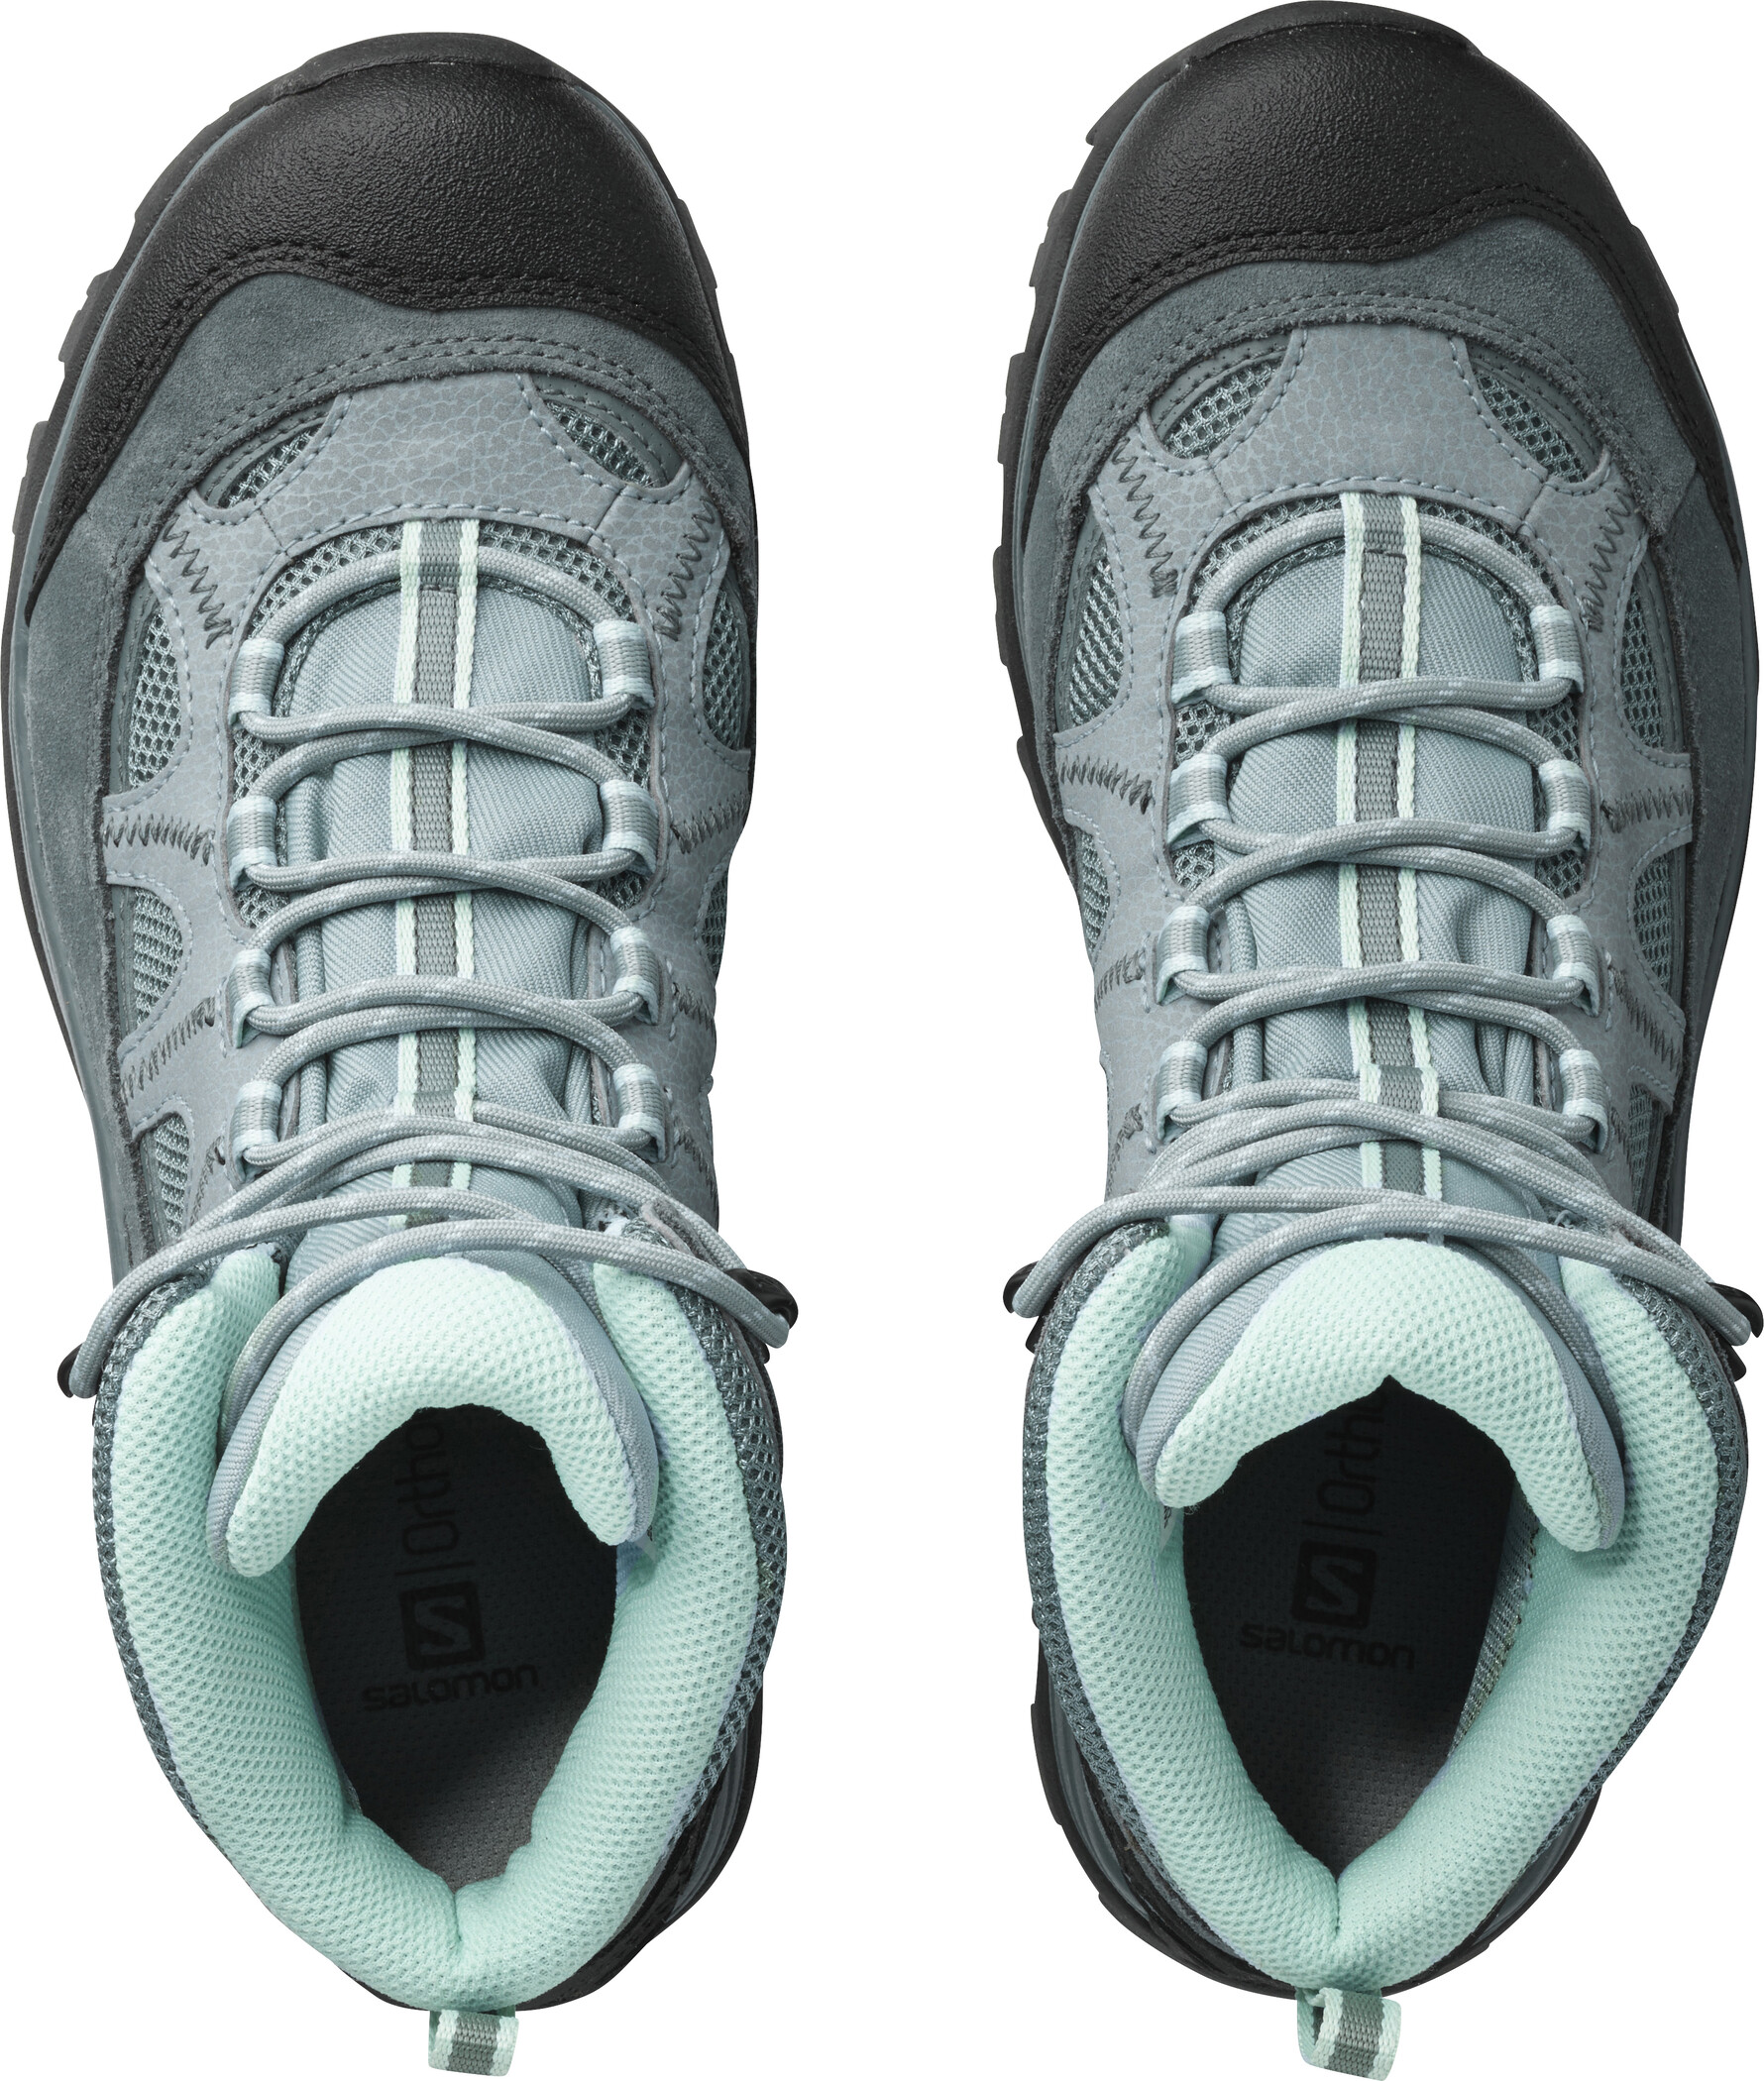 Salomon Authentic LTR GTX Shoes Dam leadstormy weathereggshell blue